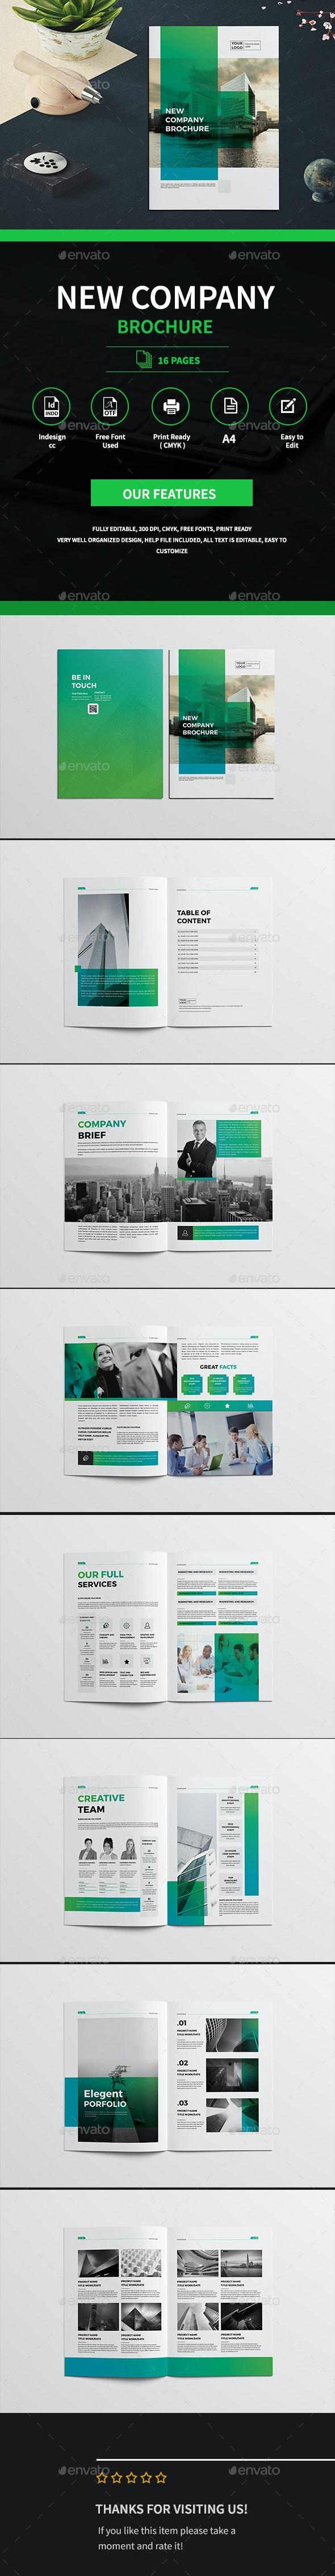 Business Company Brochure - Corporate Brochures